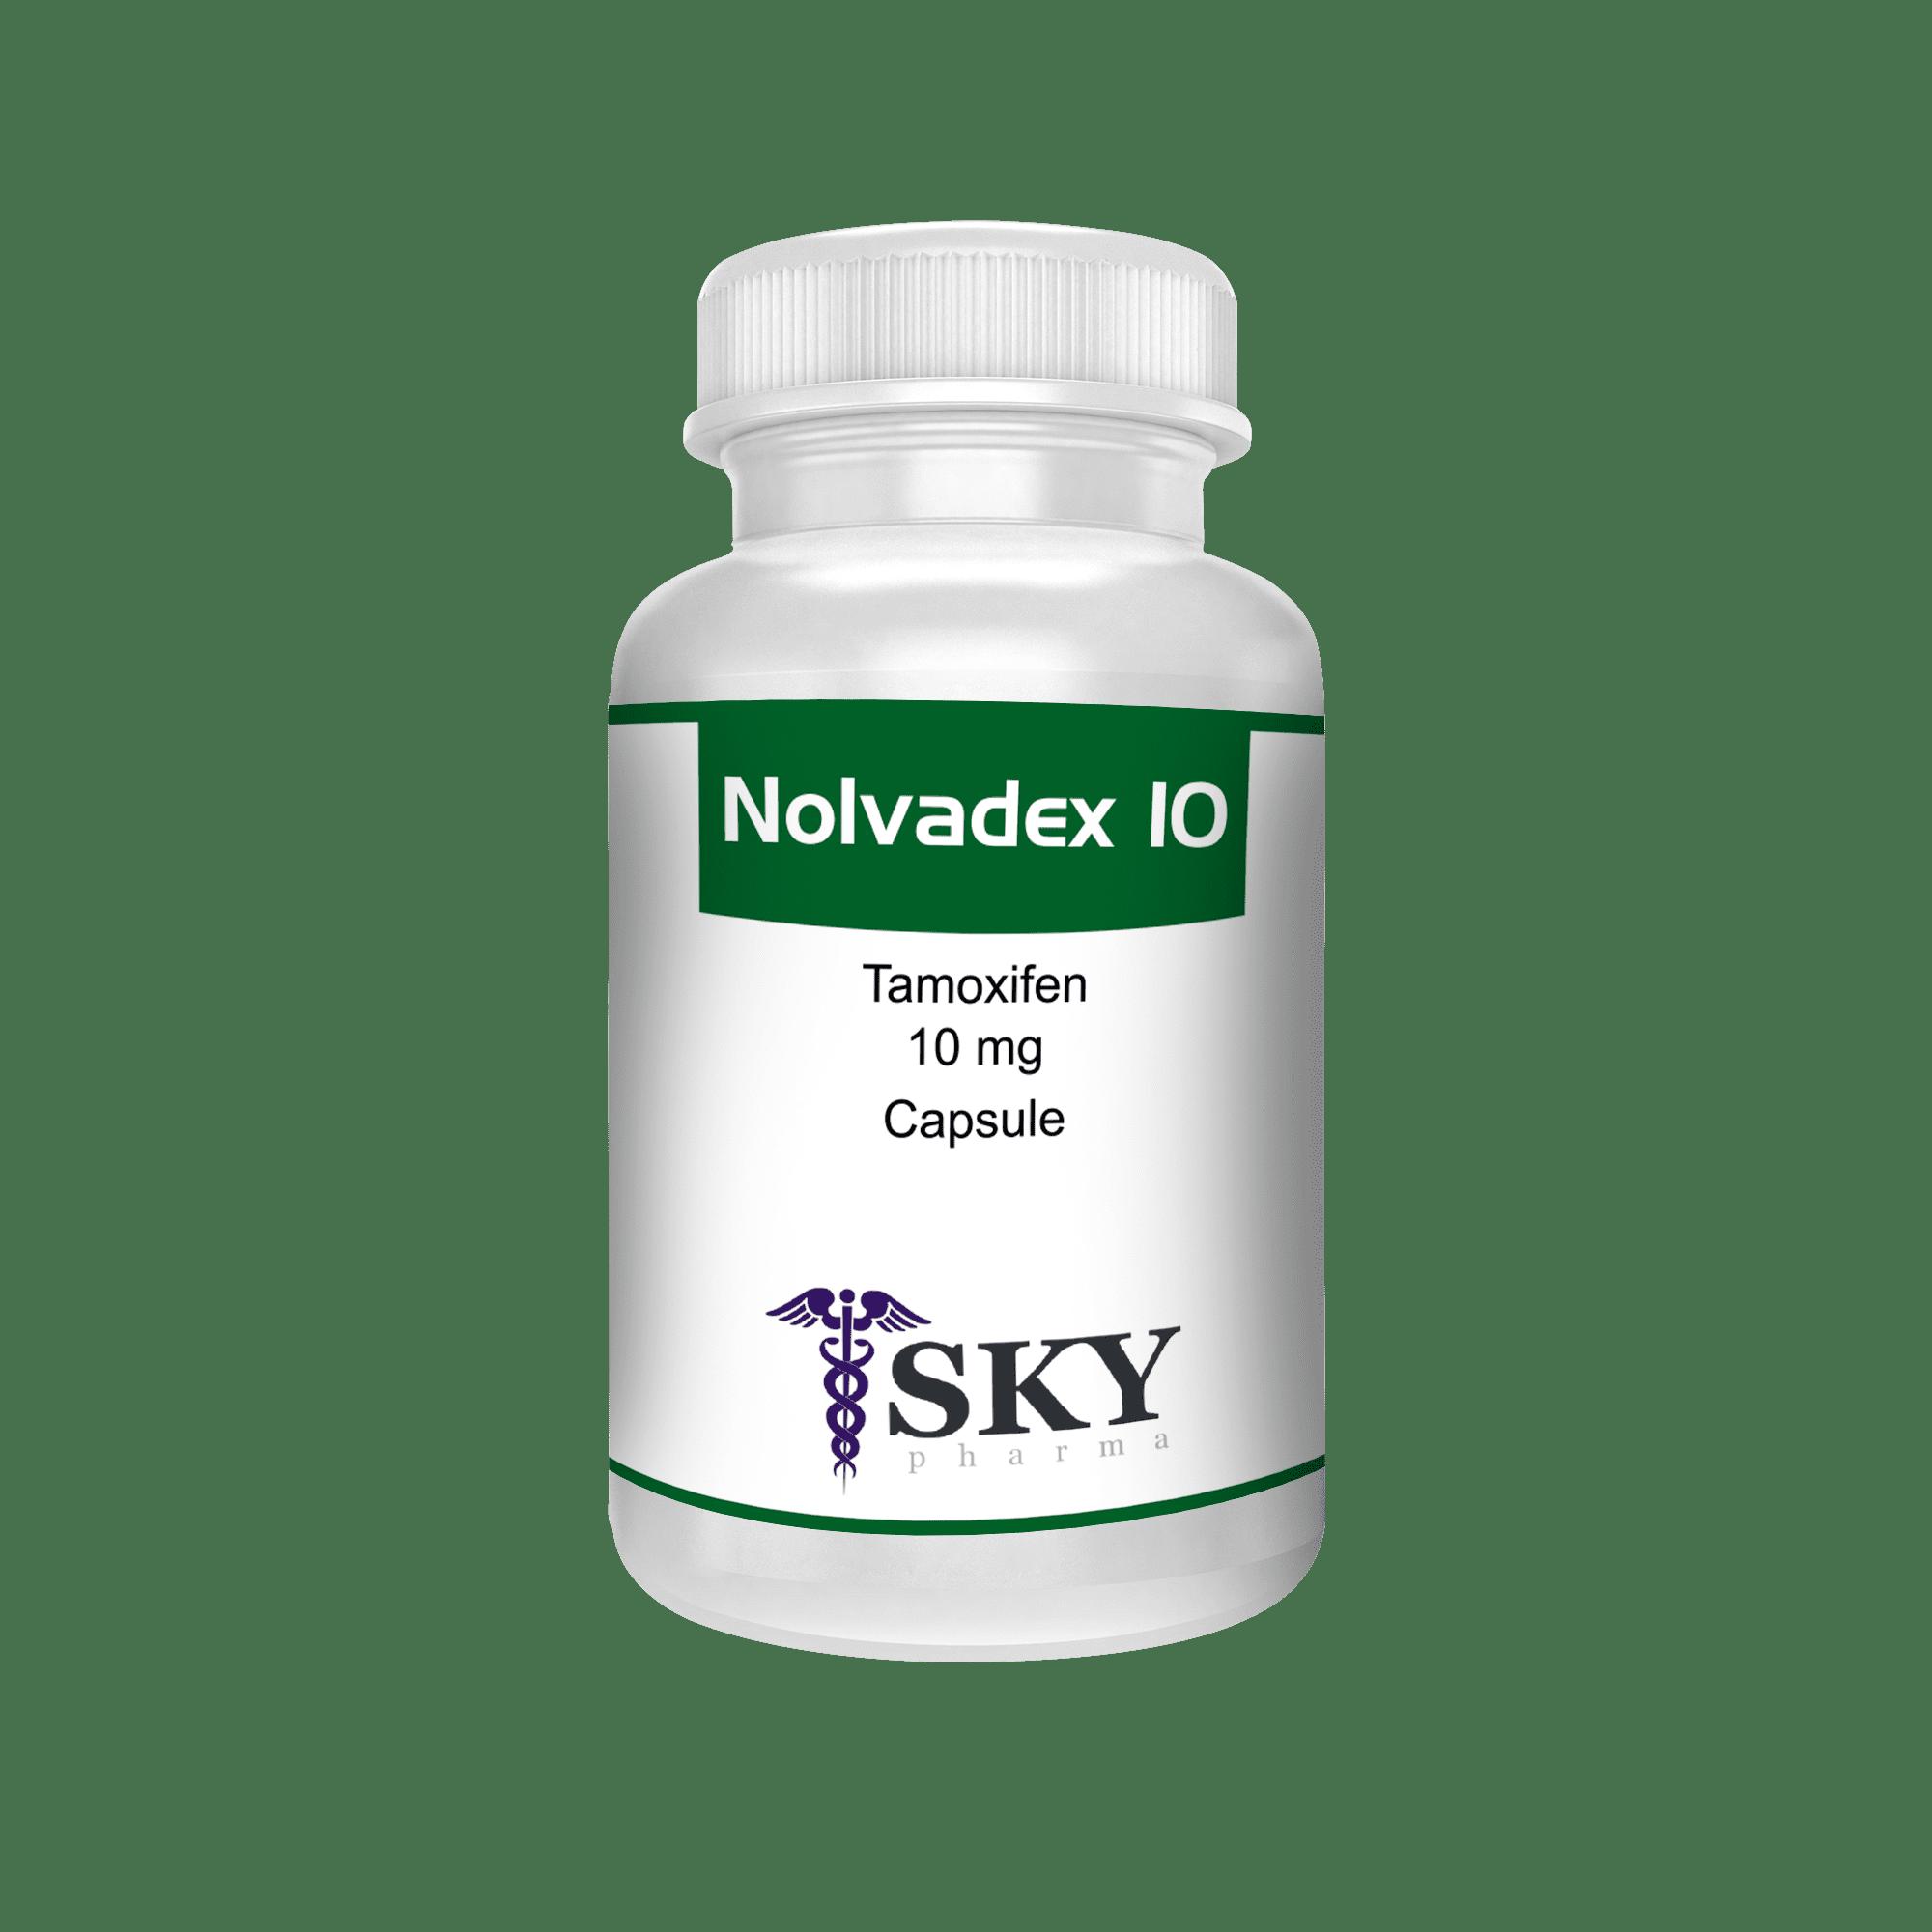 Tamoxifen (Nolvadex) 20mg/tab - Protect Unwanted Effects Of Estrogen